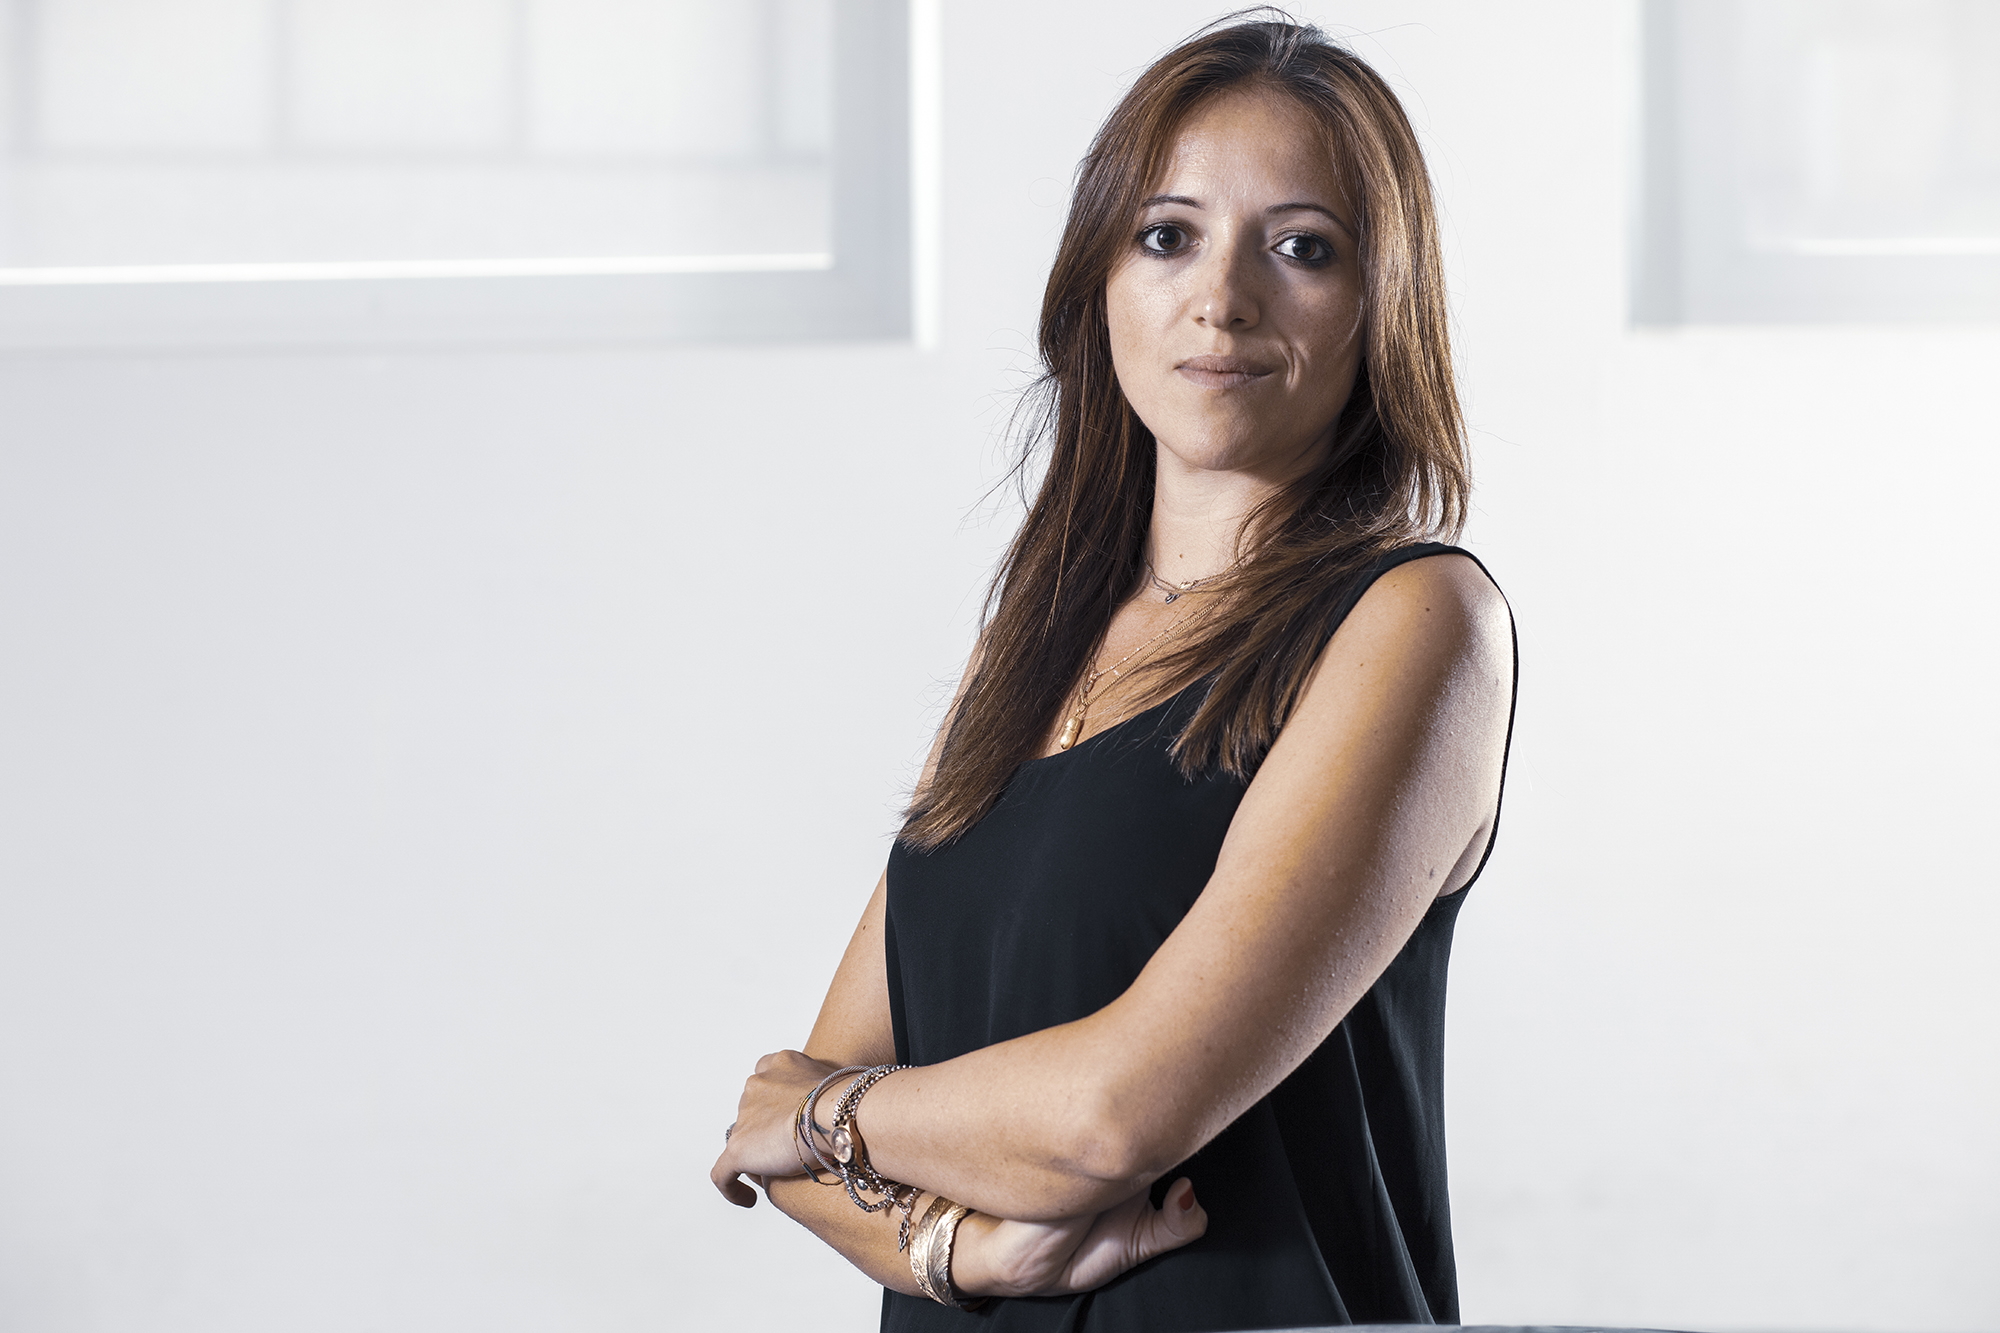 Annacarla Loperfido Organization Development Manager